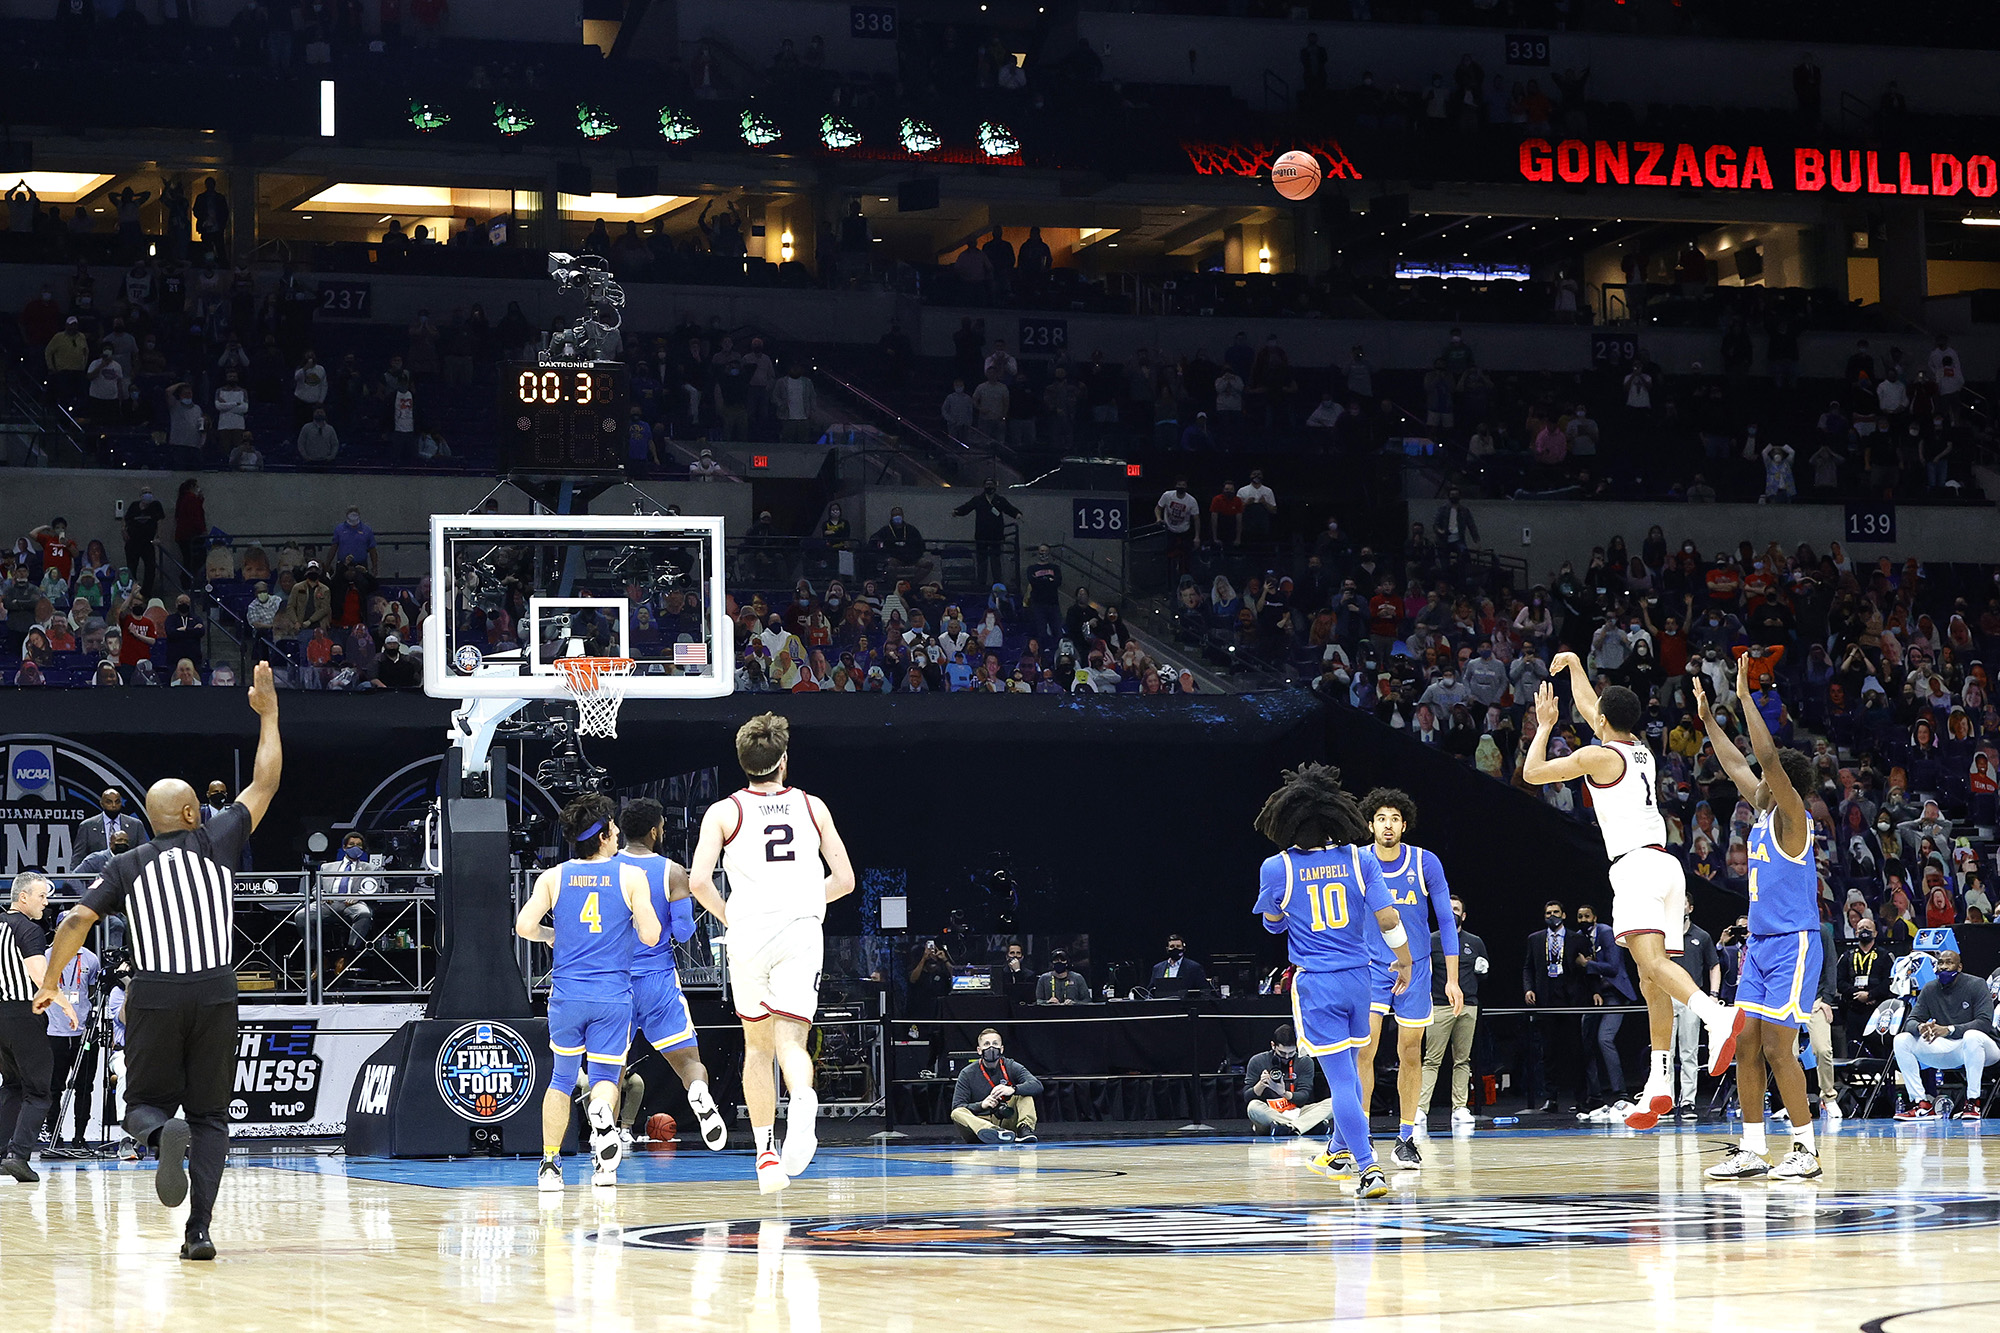 Jack Beach Gonzaga Bulldogs Final Four Basketball Jersey - White